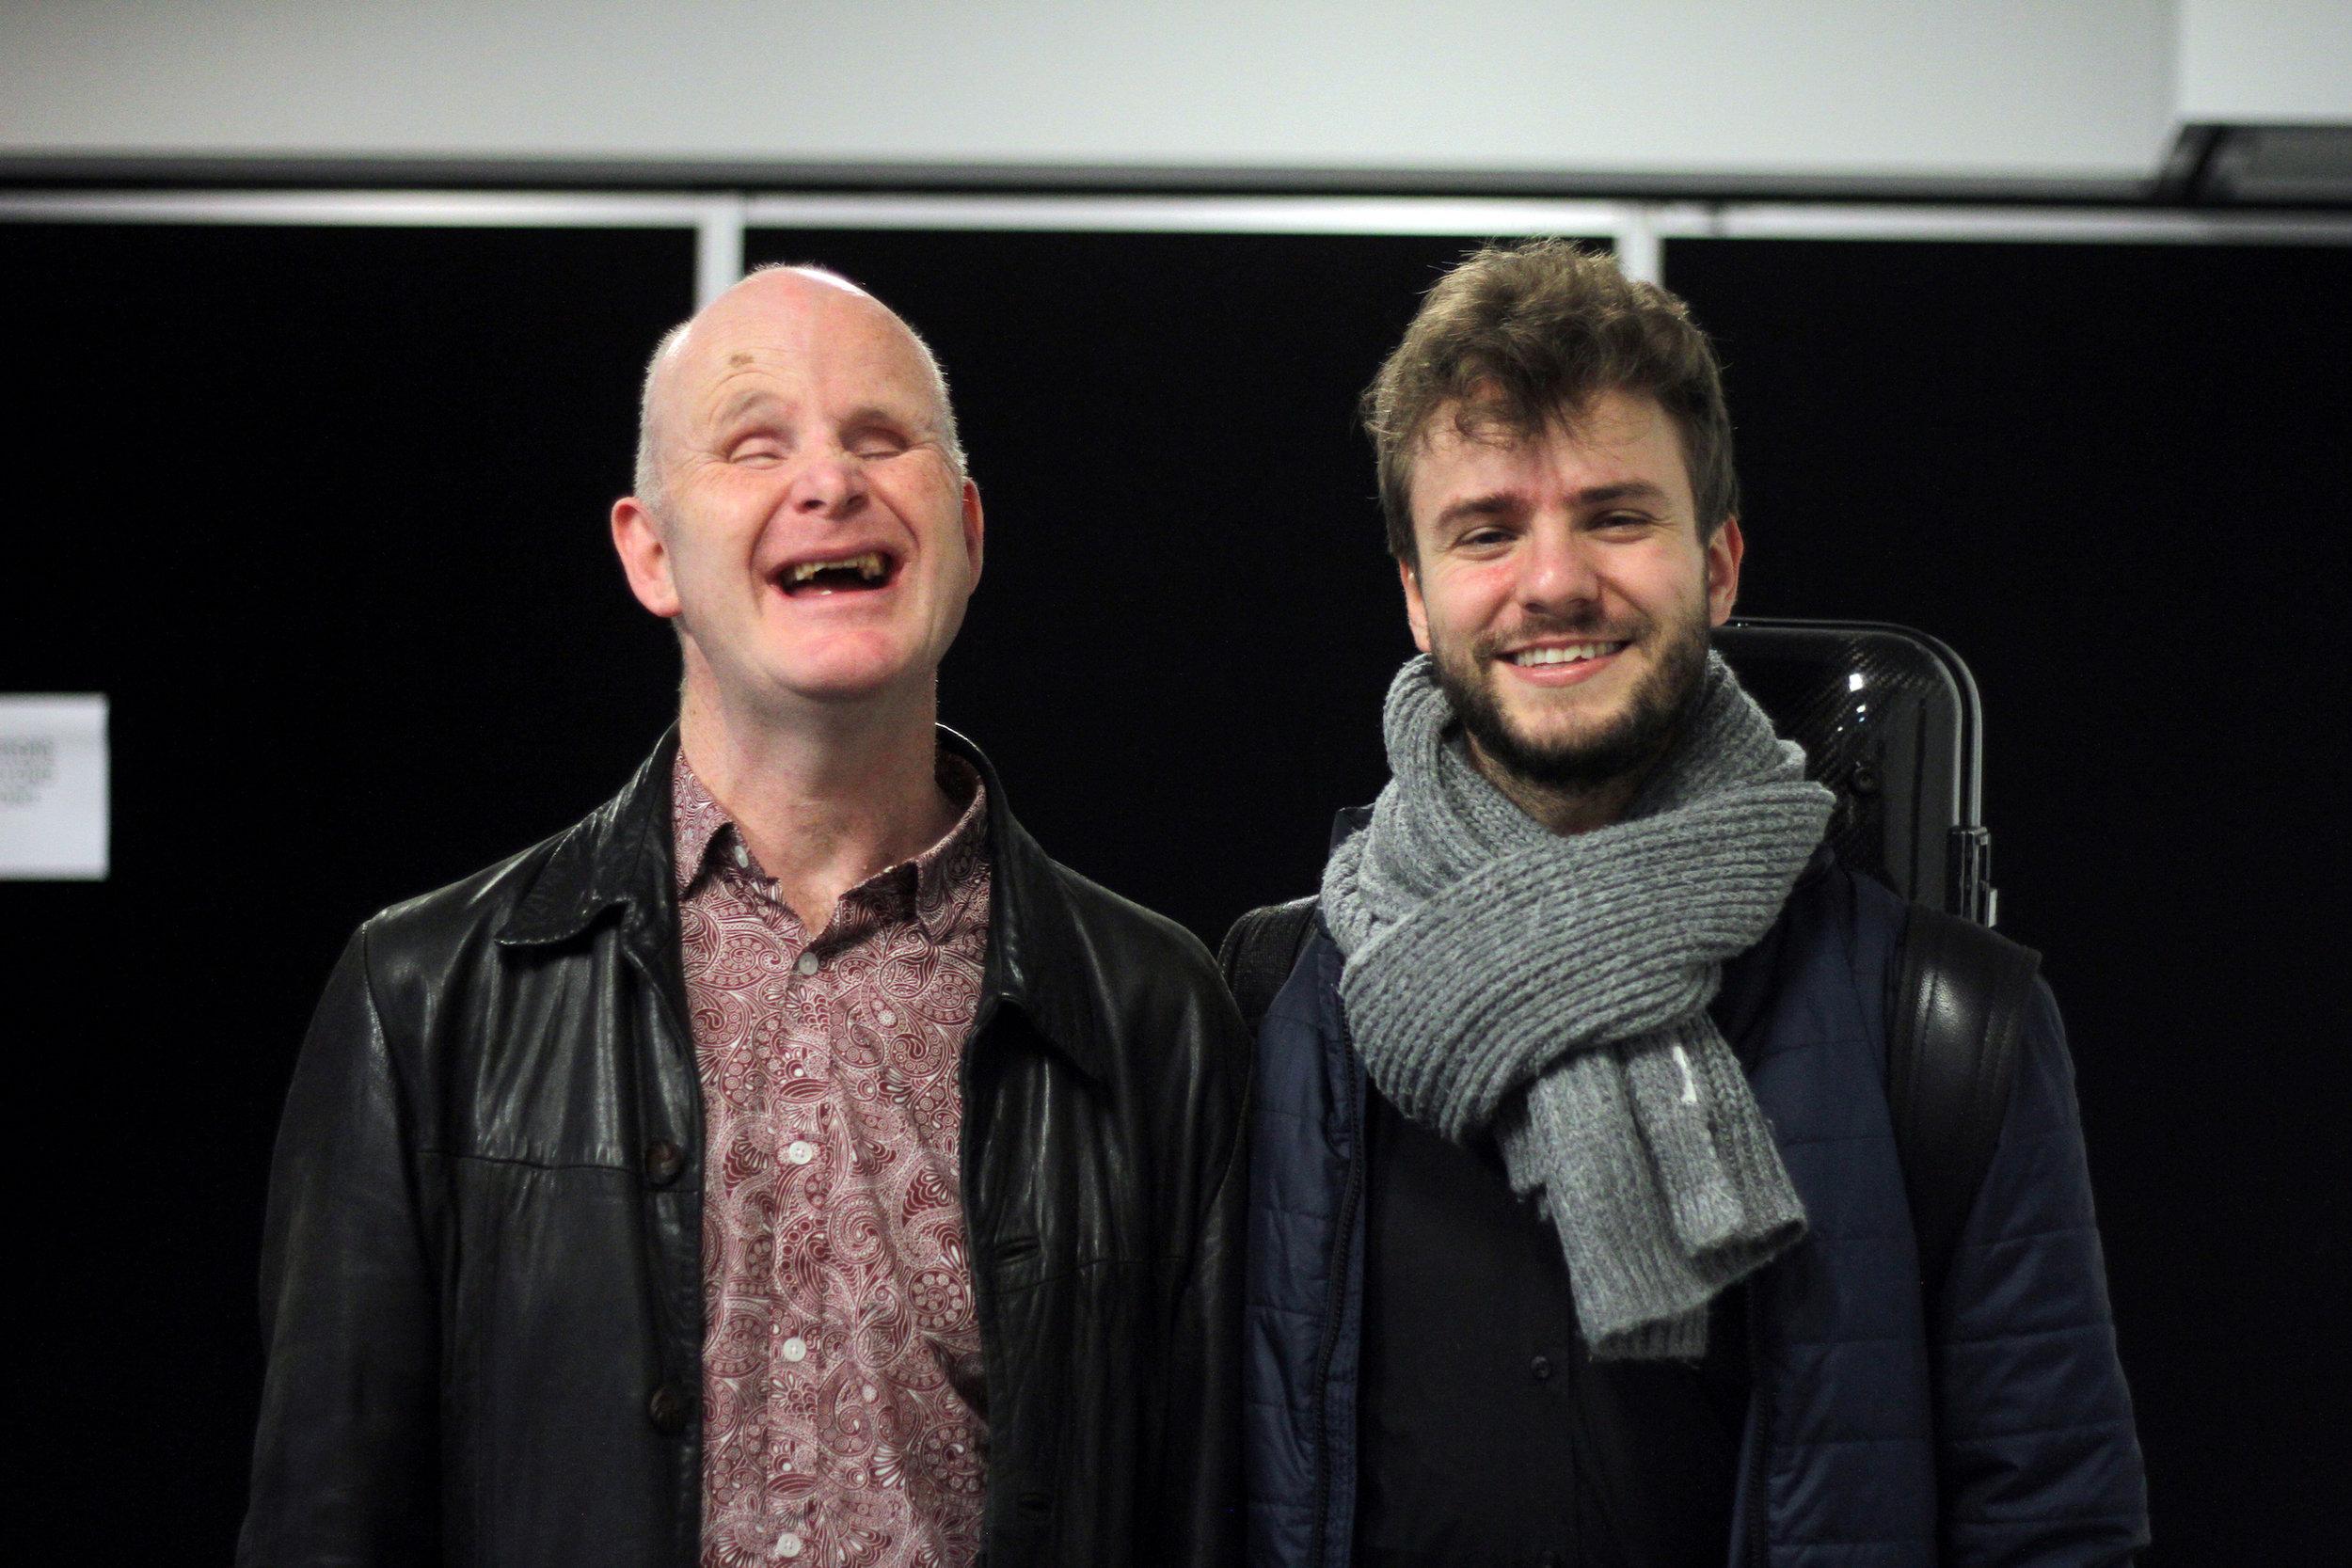 Accordionist Mark Wilson and Violinist Matthias Well